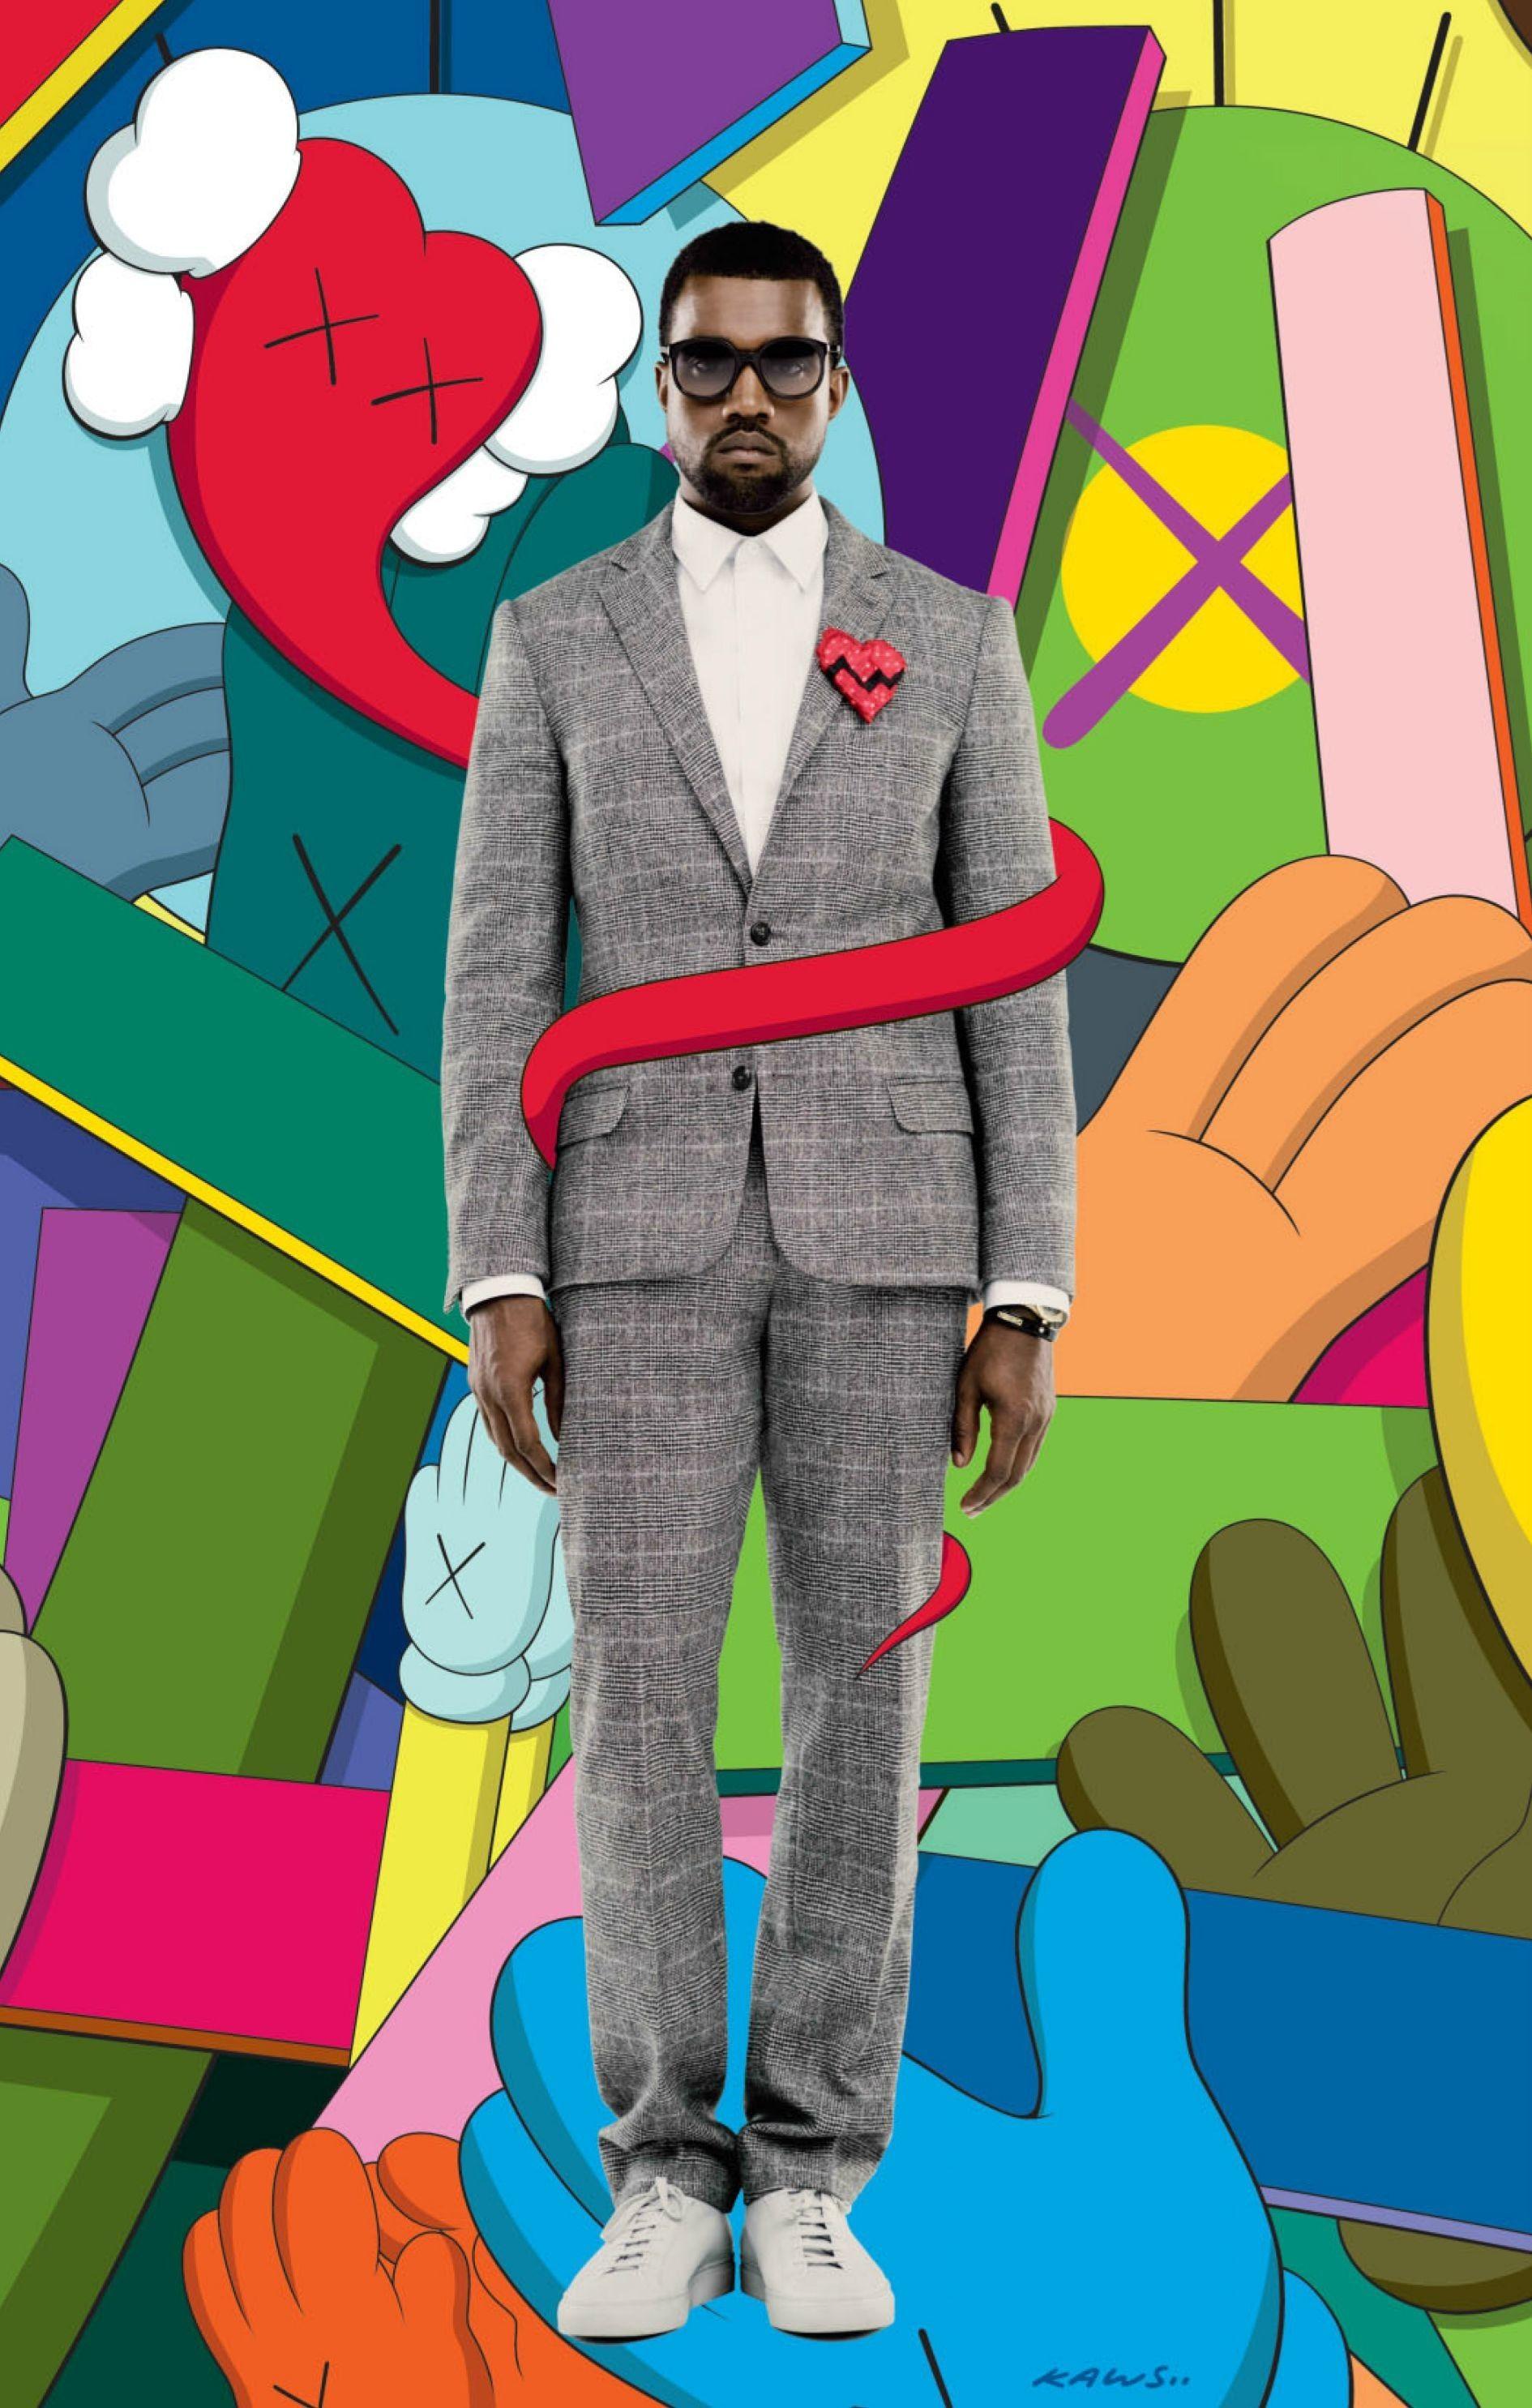 Google Image Result For Http Getwallpapers Com Wallpaper Full 7 3 6 921201 Full Size Kanye West 808s Heartbreak B Kanye West Heartbreak Art 808s Heartbreak